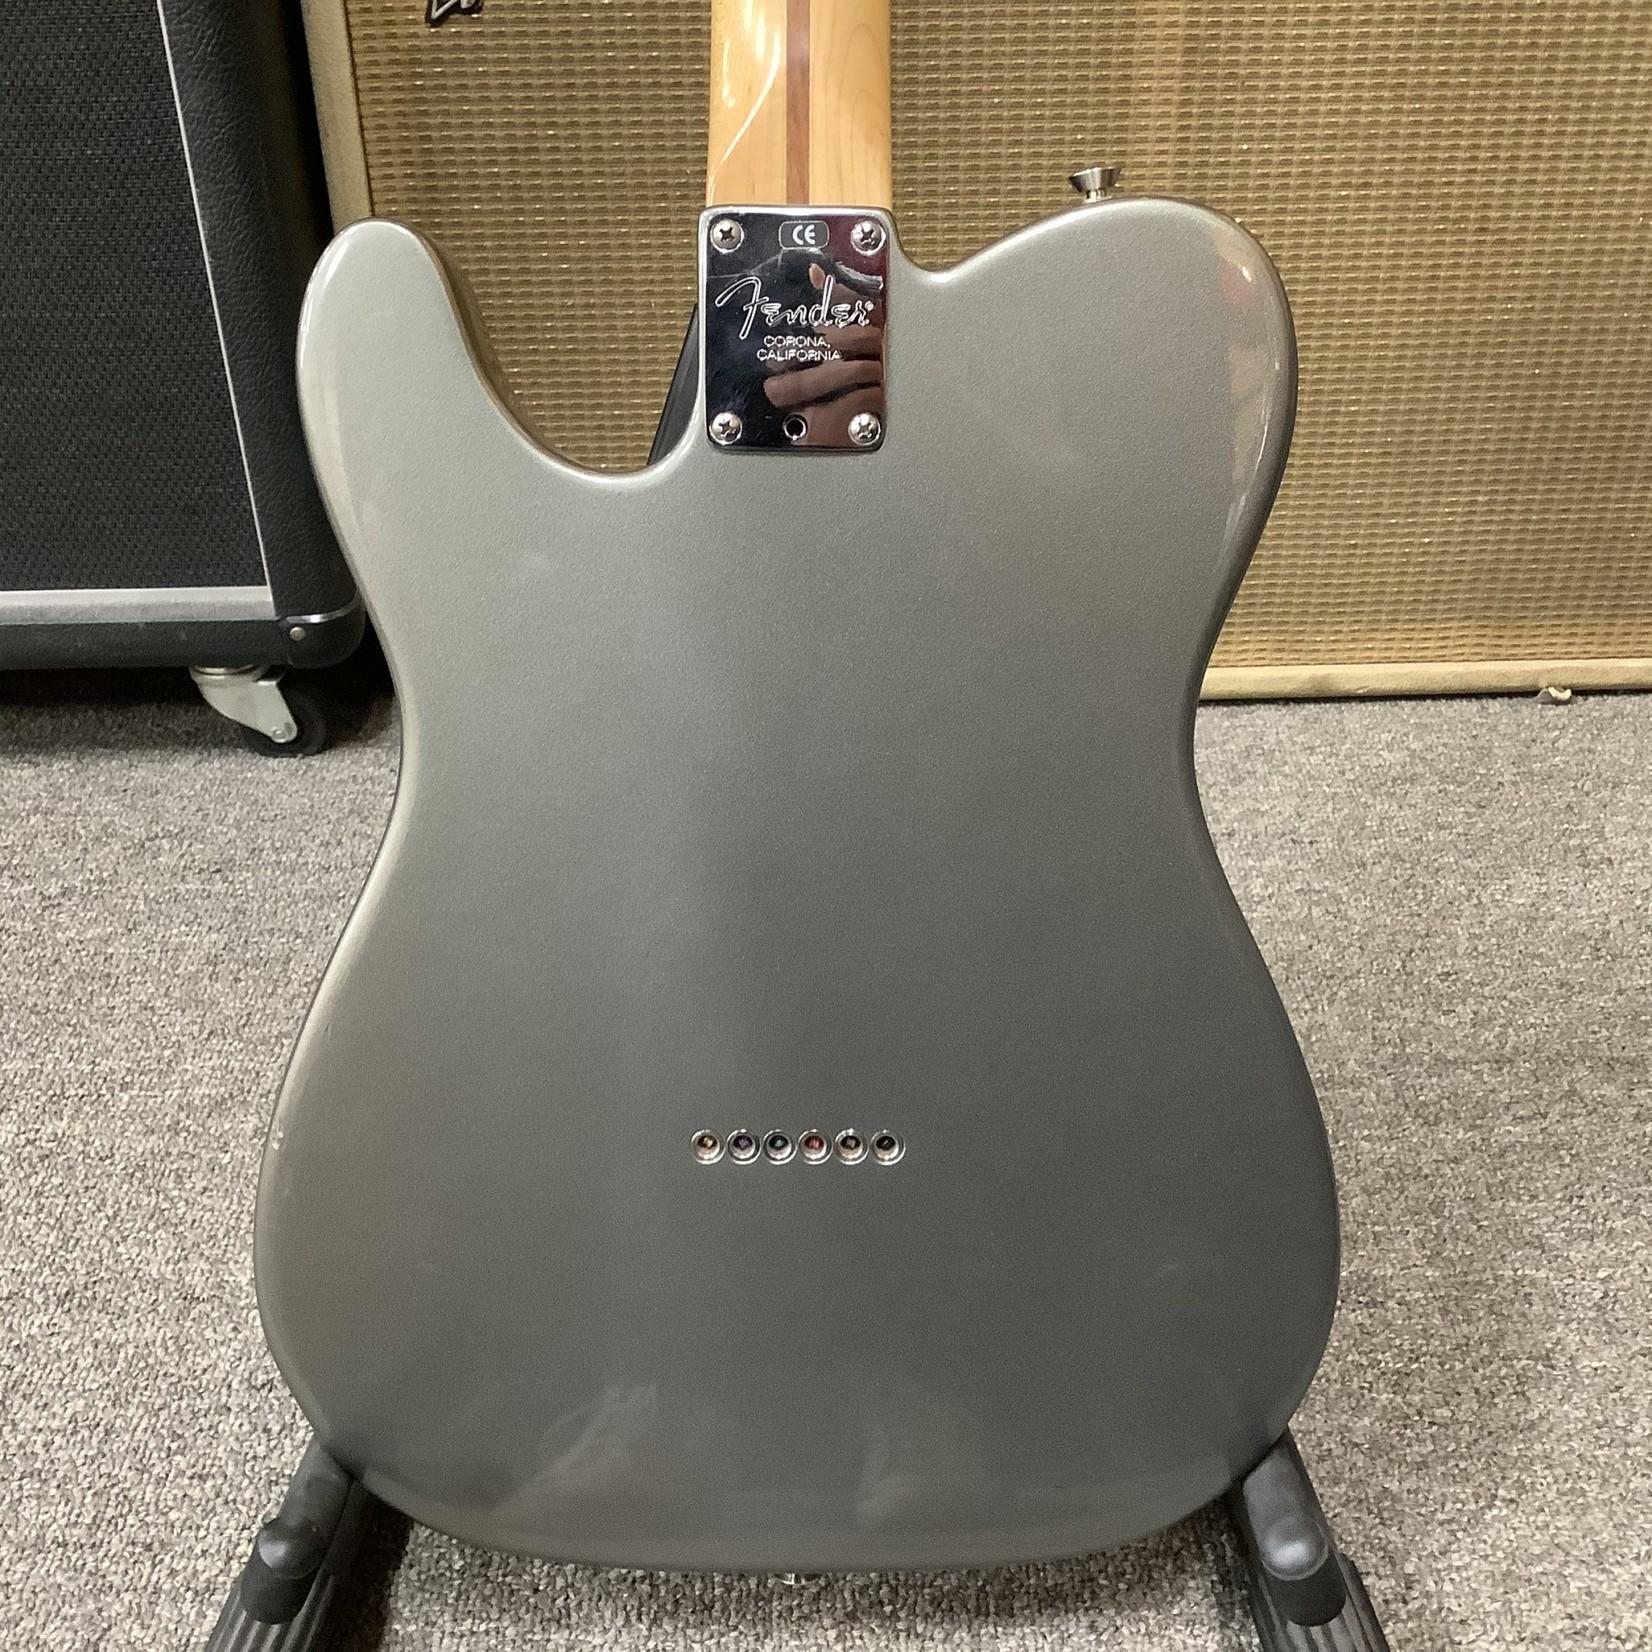 Fender 2004-5 Fender Telecaster H-S Maple Neck, Charcoal Sparkle